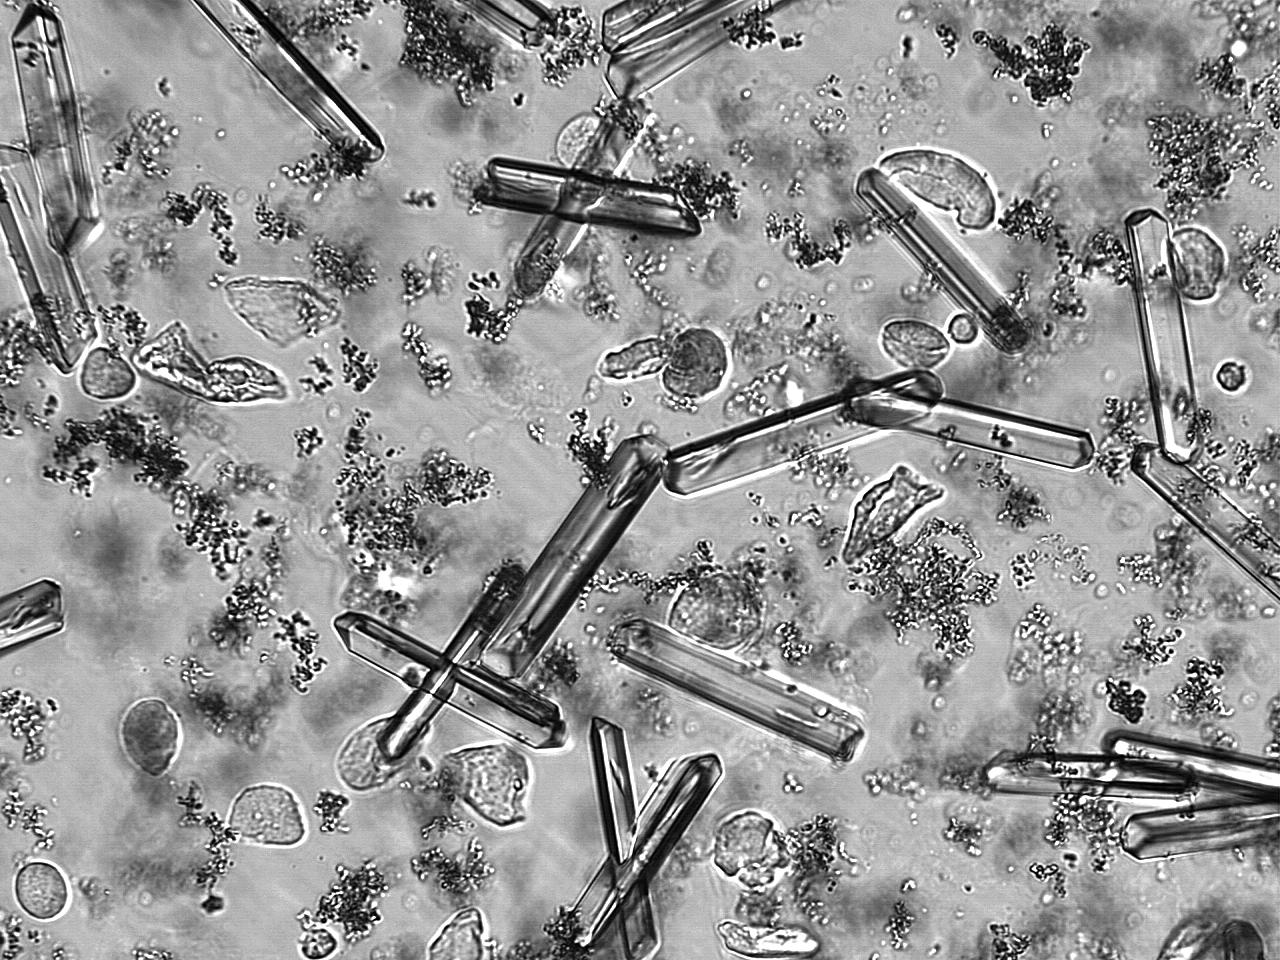 Struvite Crystals Microscope File:struvite Crystals Urine